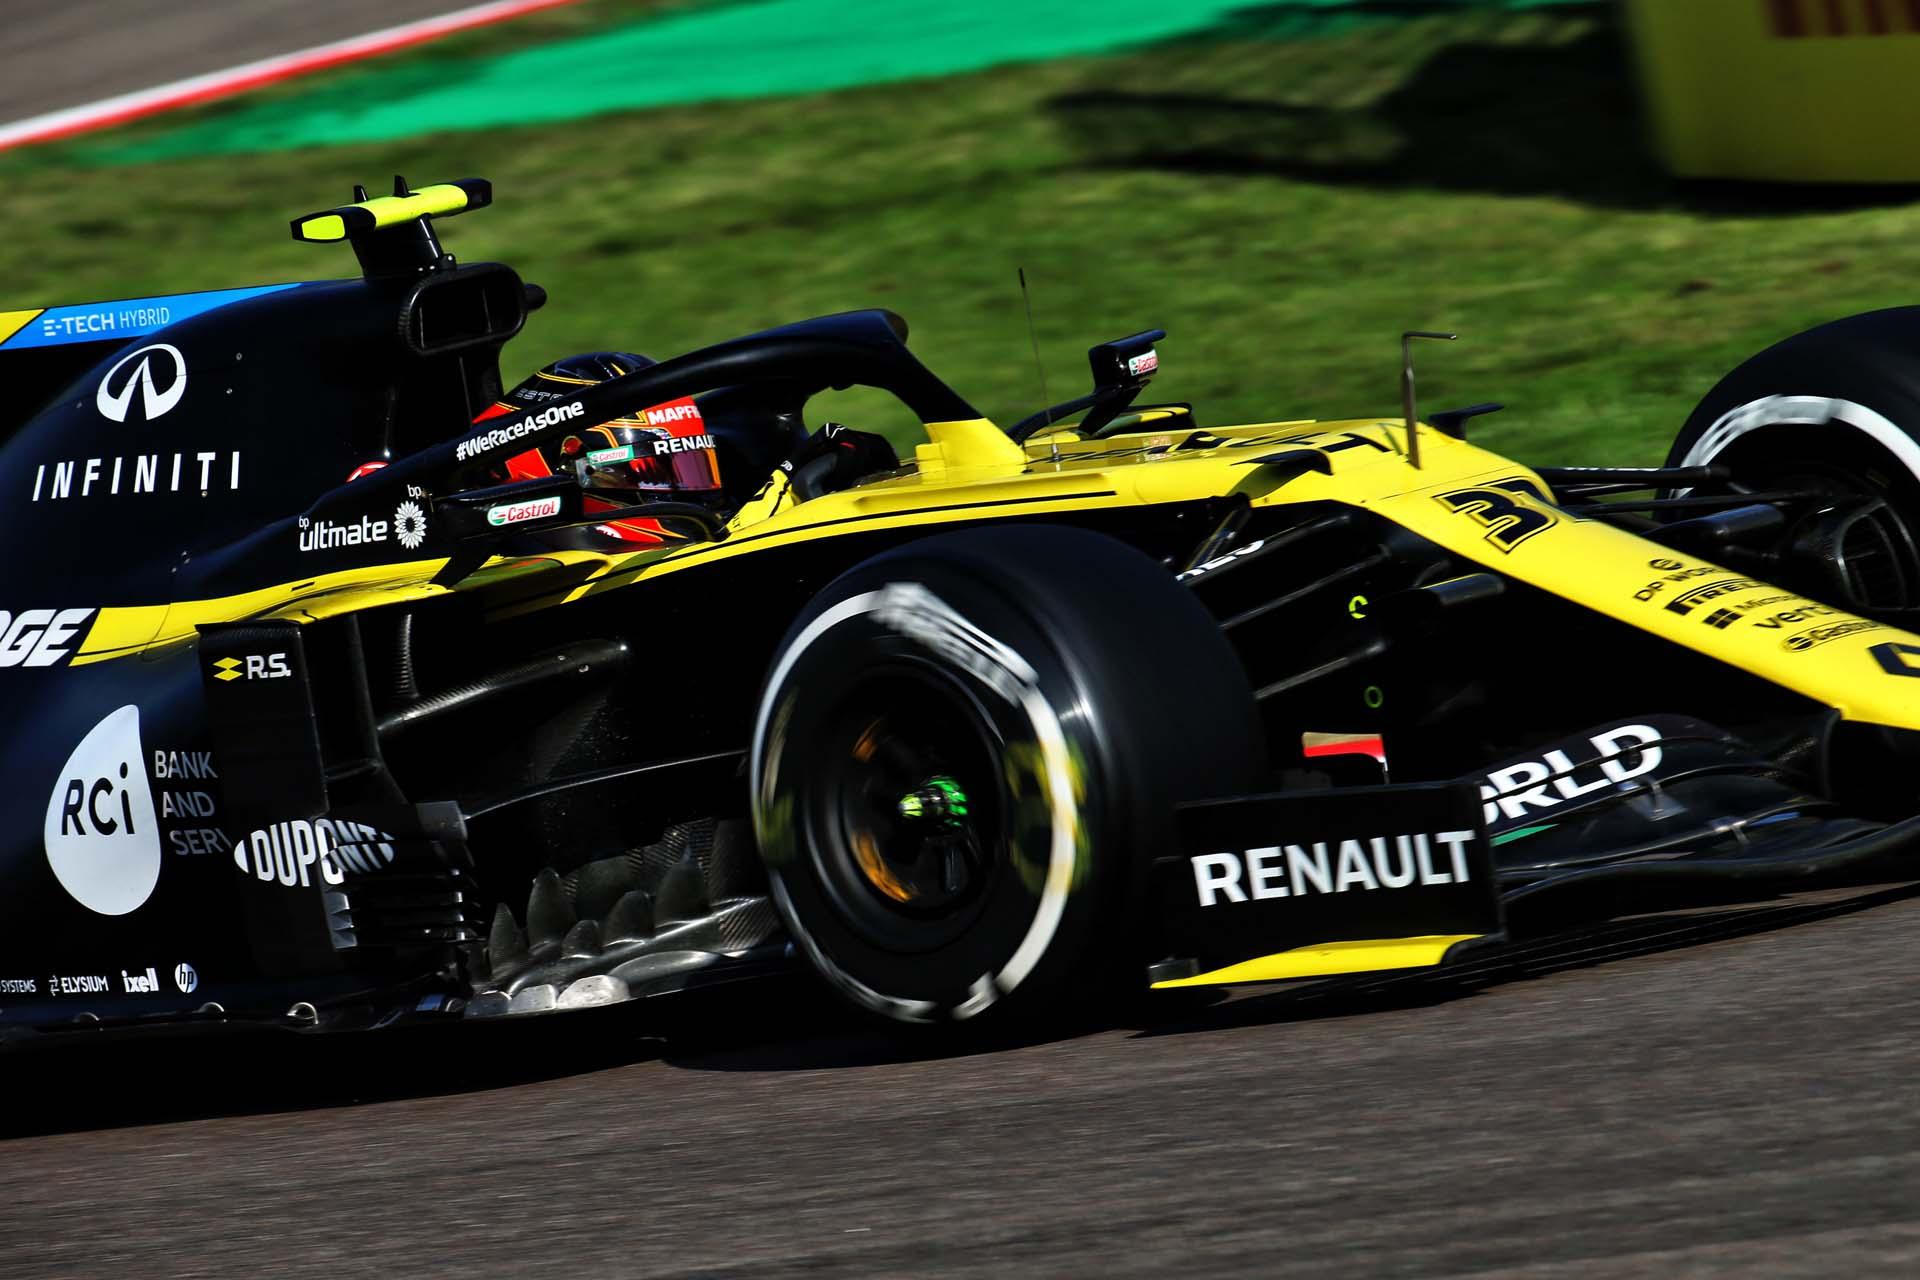 Motor Racing - Formula One World Championship - Emilia Romagna Grand Prix - Qualifying Day - Imola, Italy